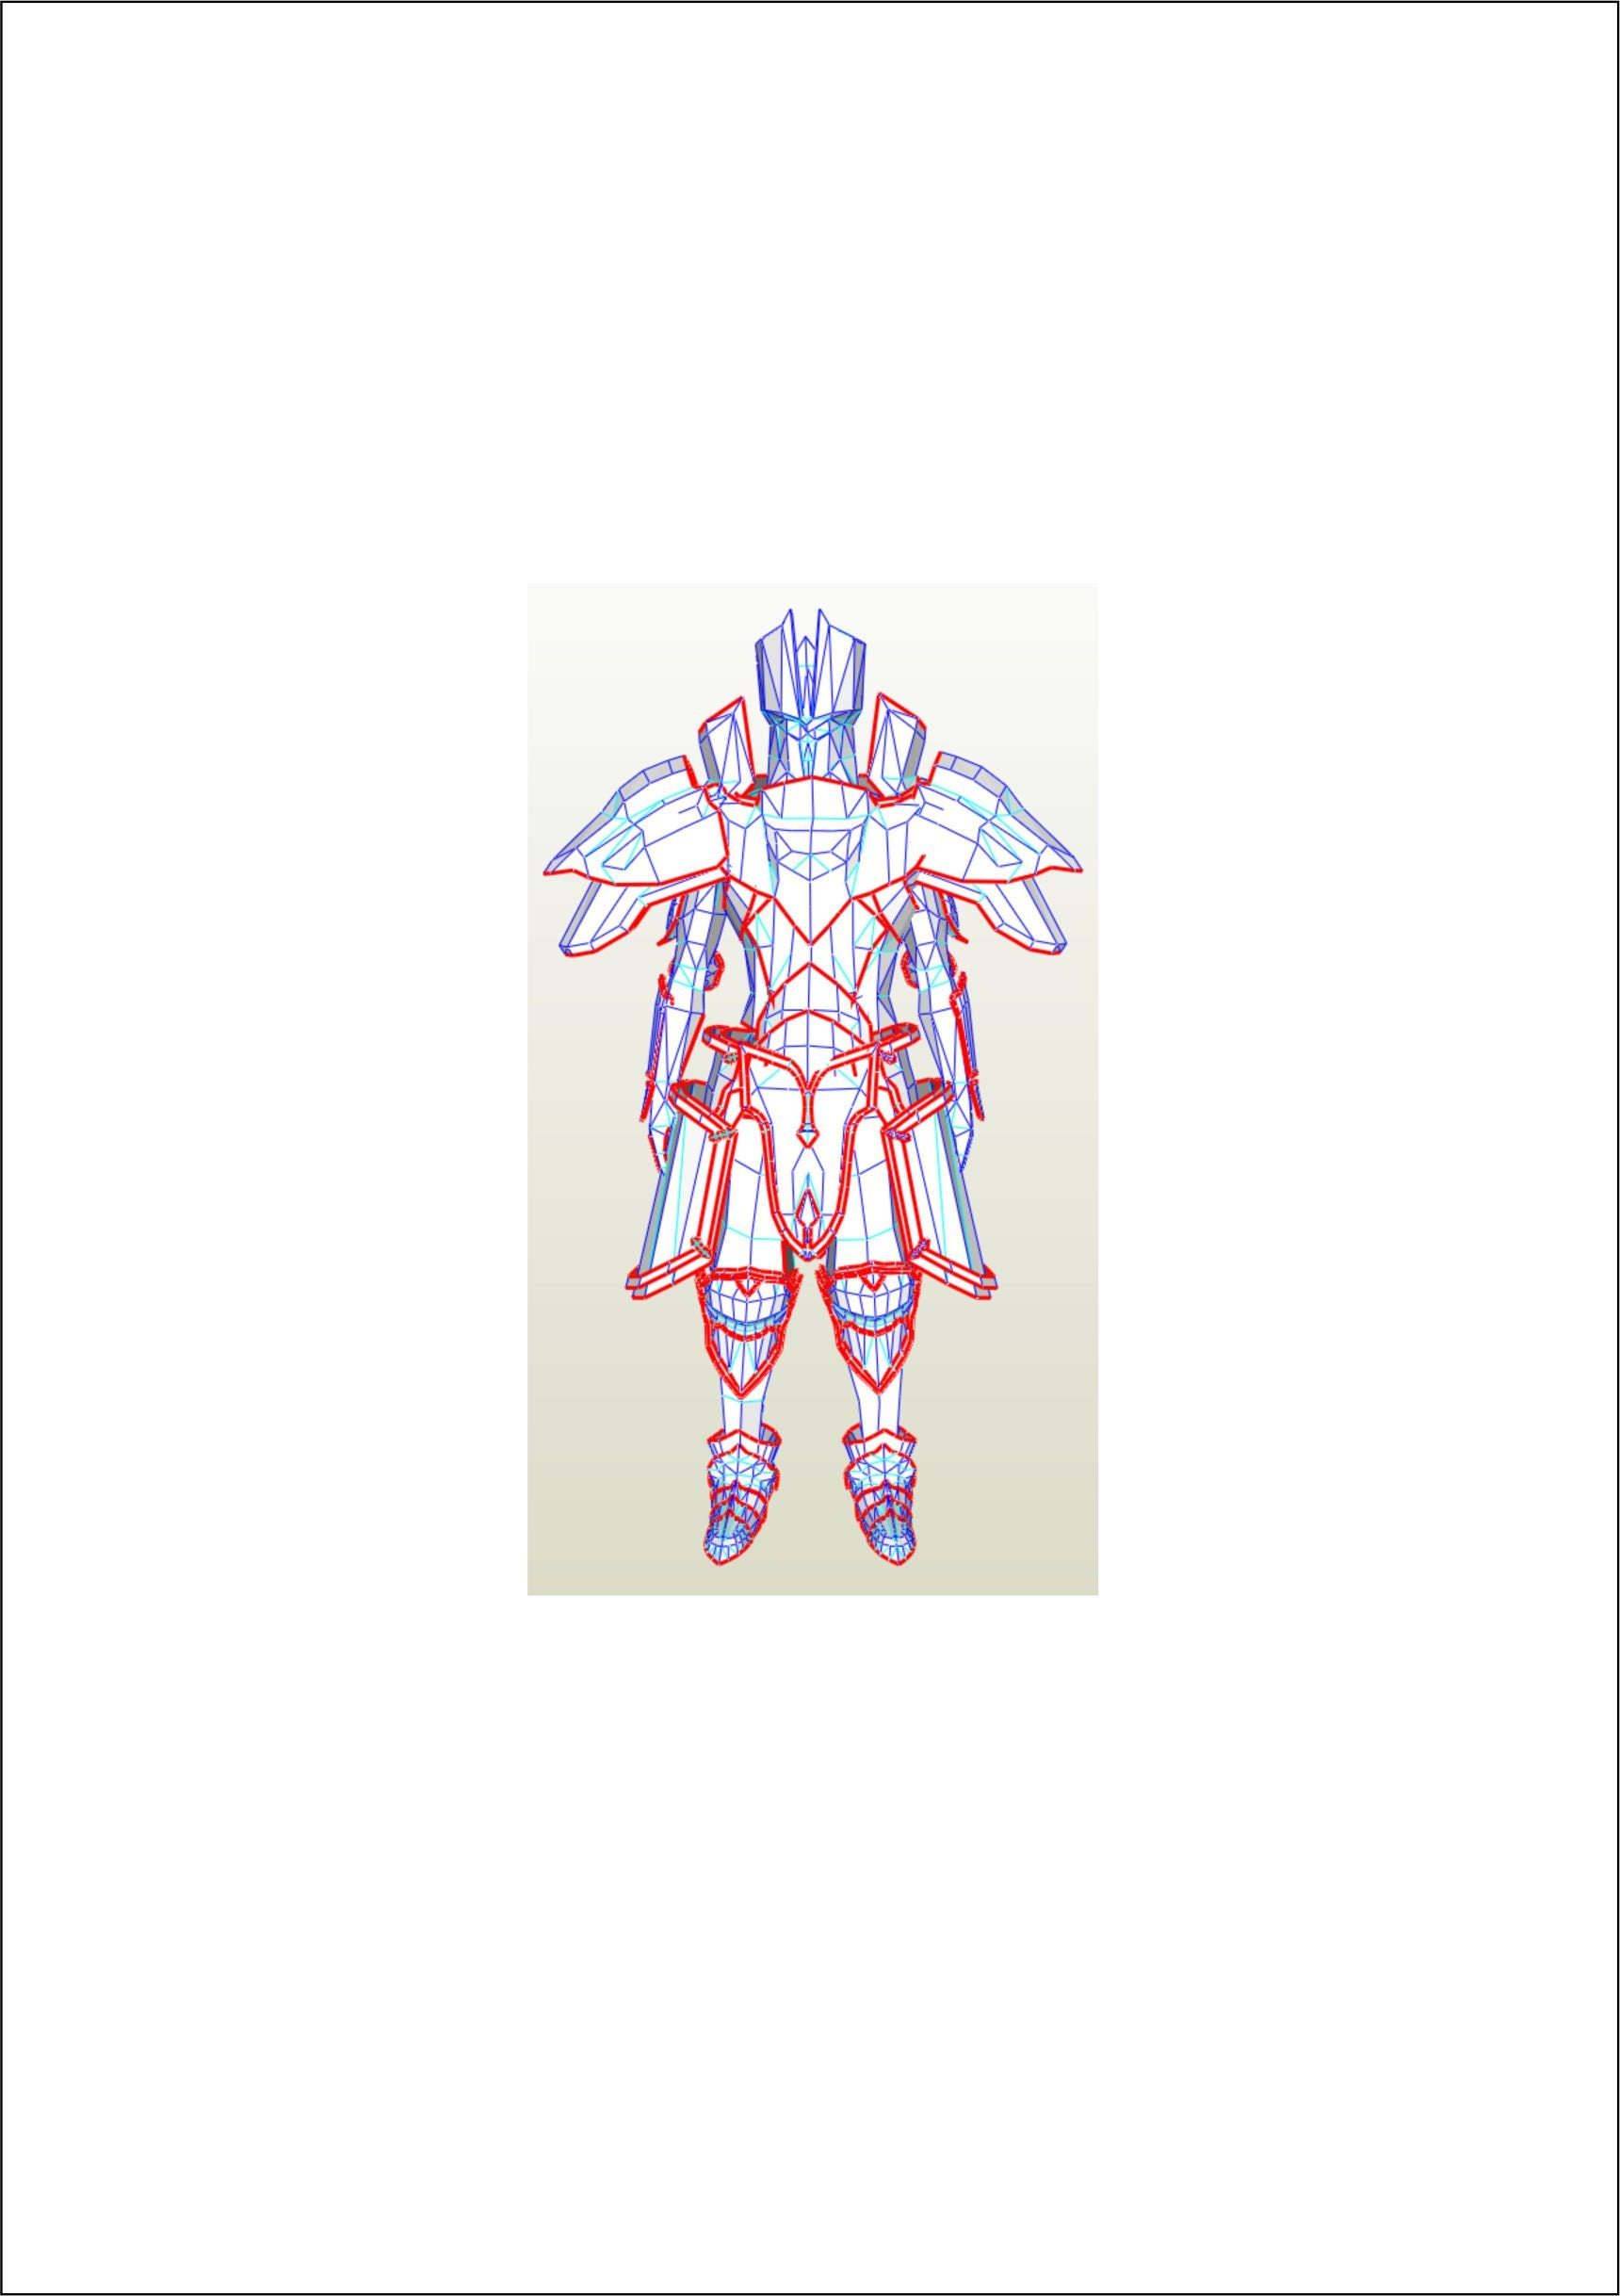 Fire Emblem Dark Knight Costume Eva Foam Templates Etsy